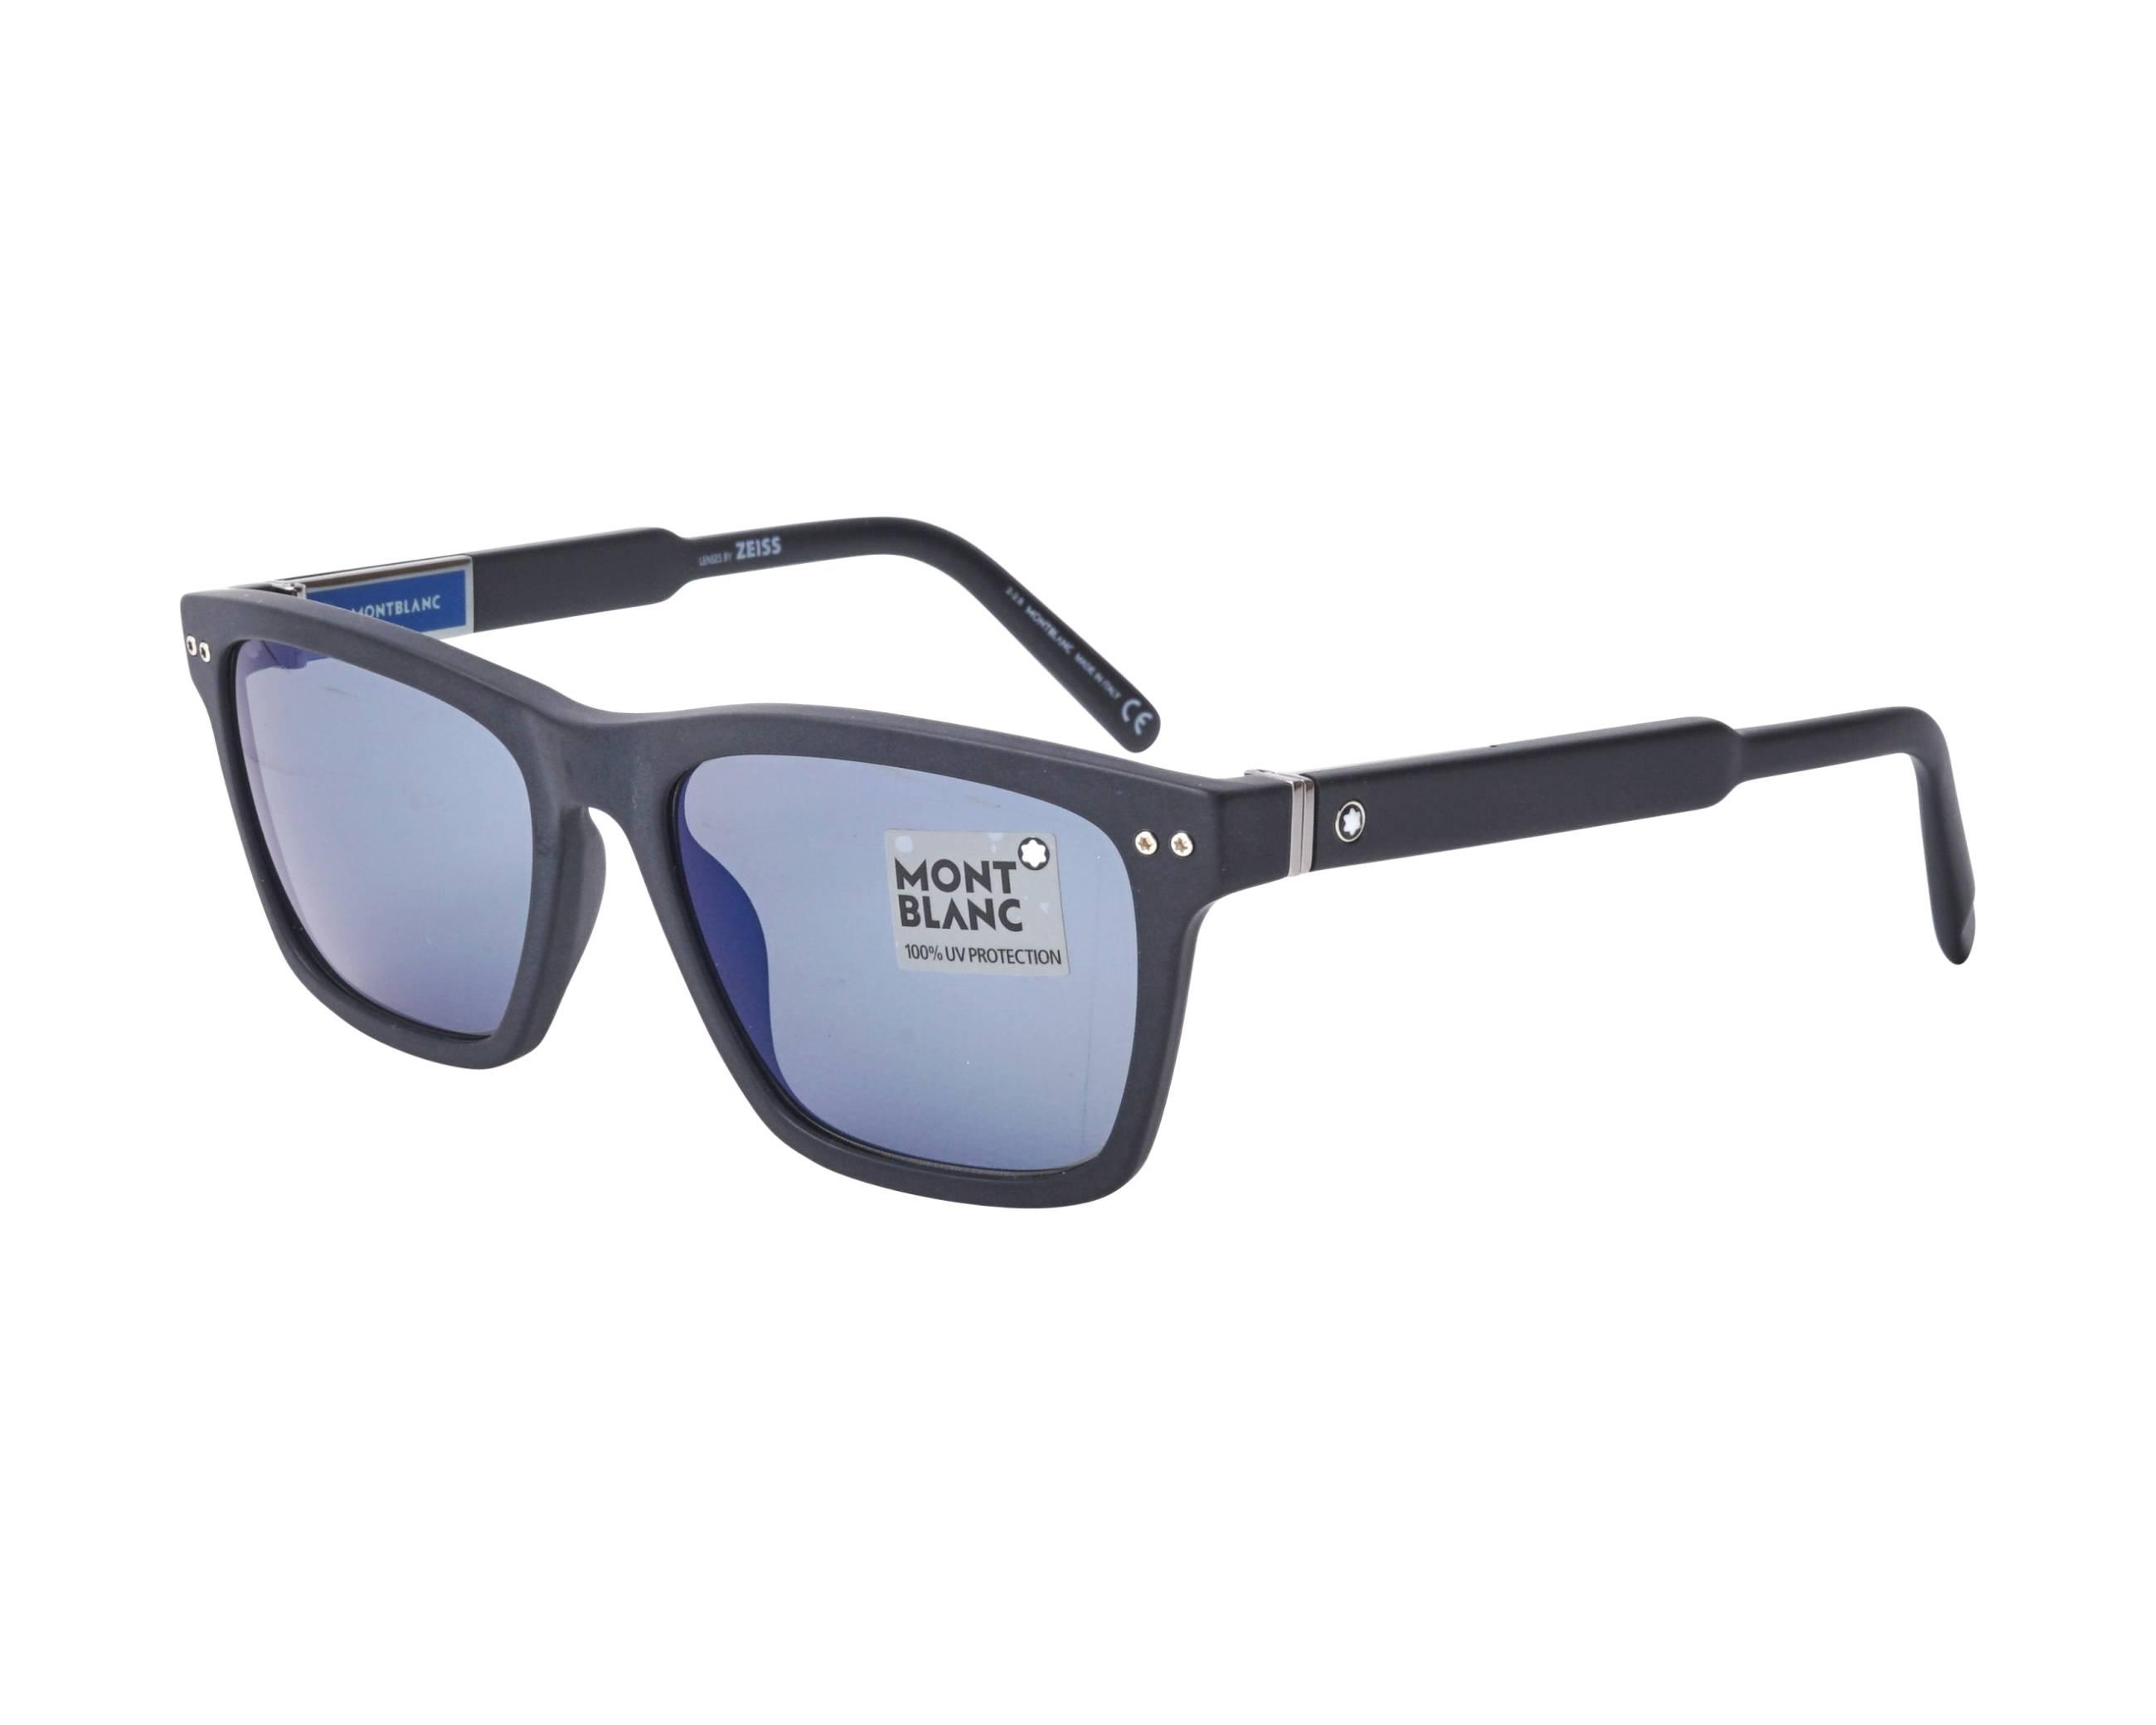 e718b8f6a6 Gafas de sol Mont Blanc MB-694-S 02X 56-17 Negra vista